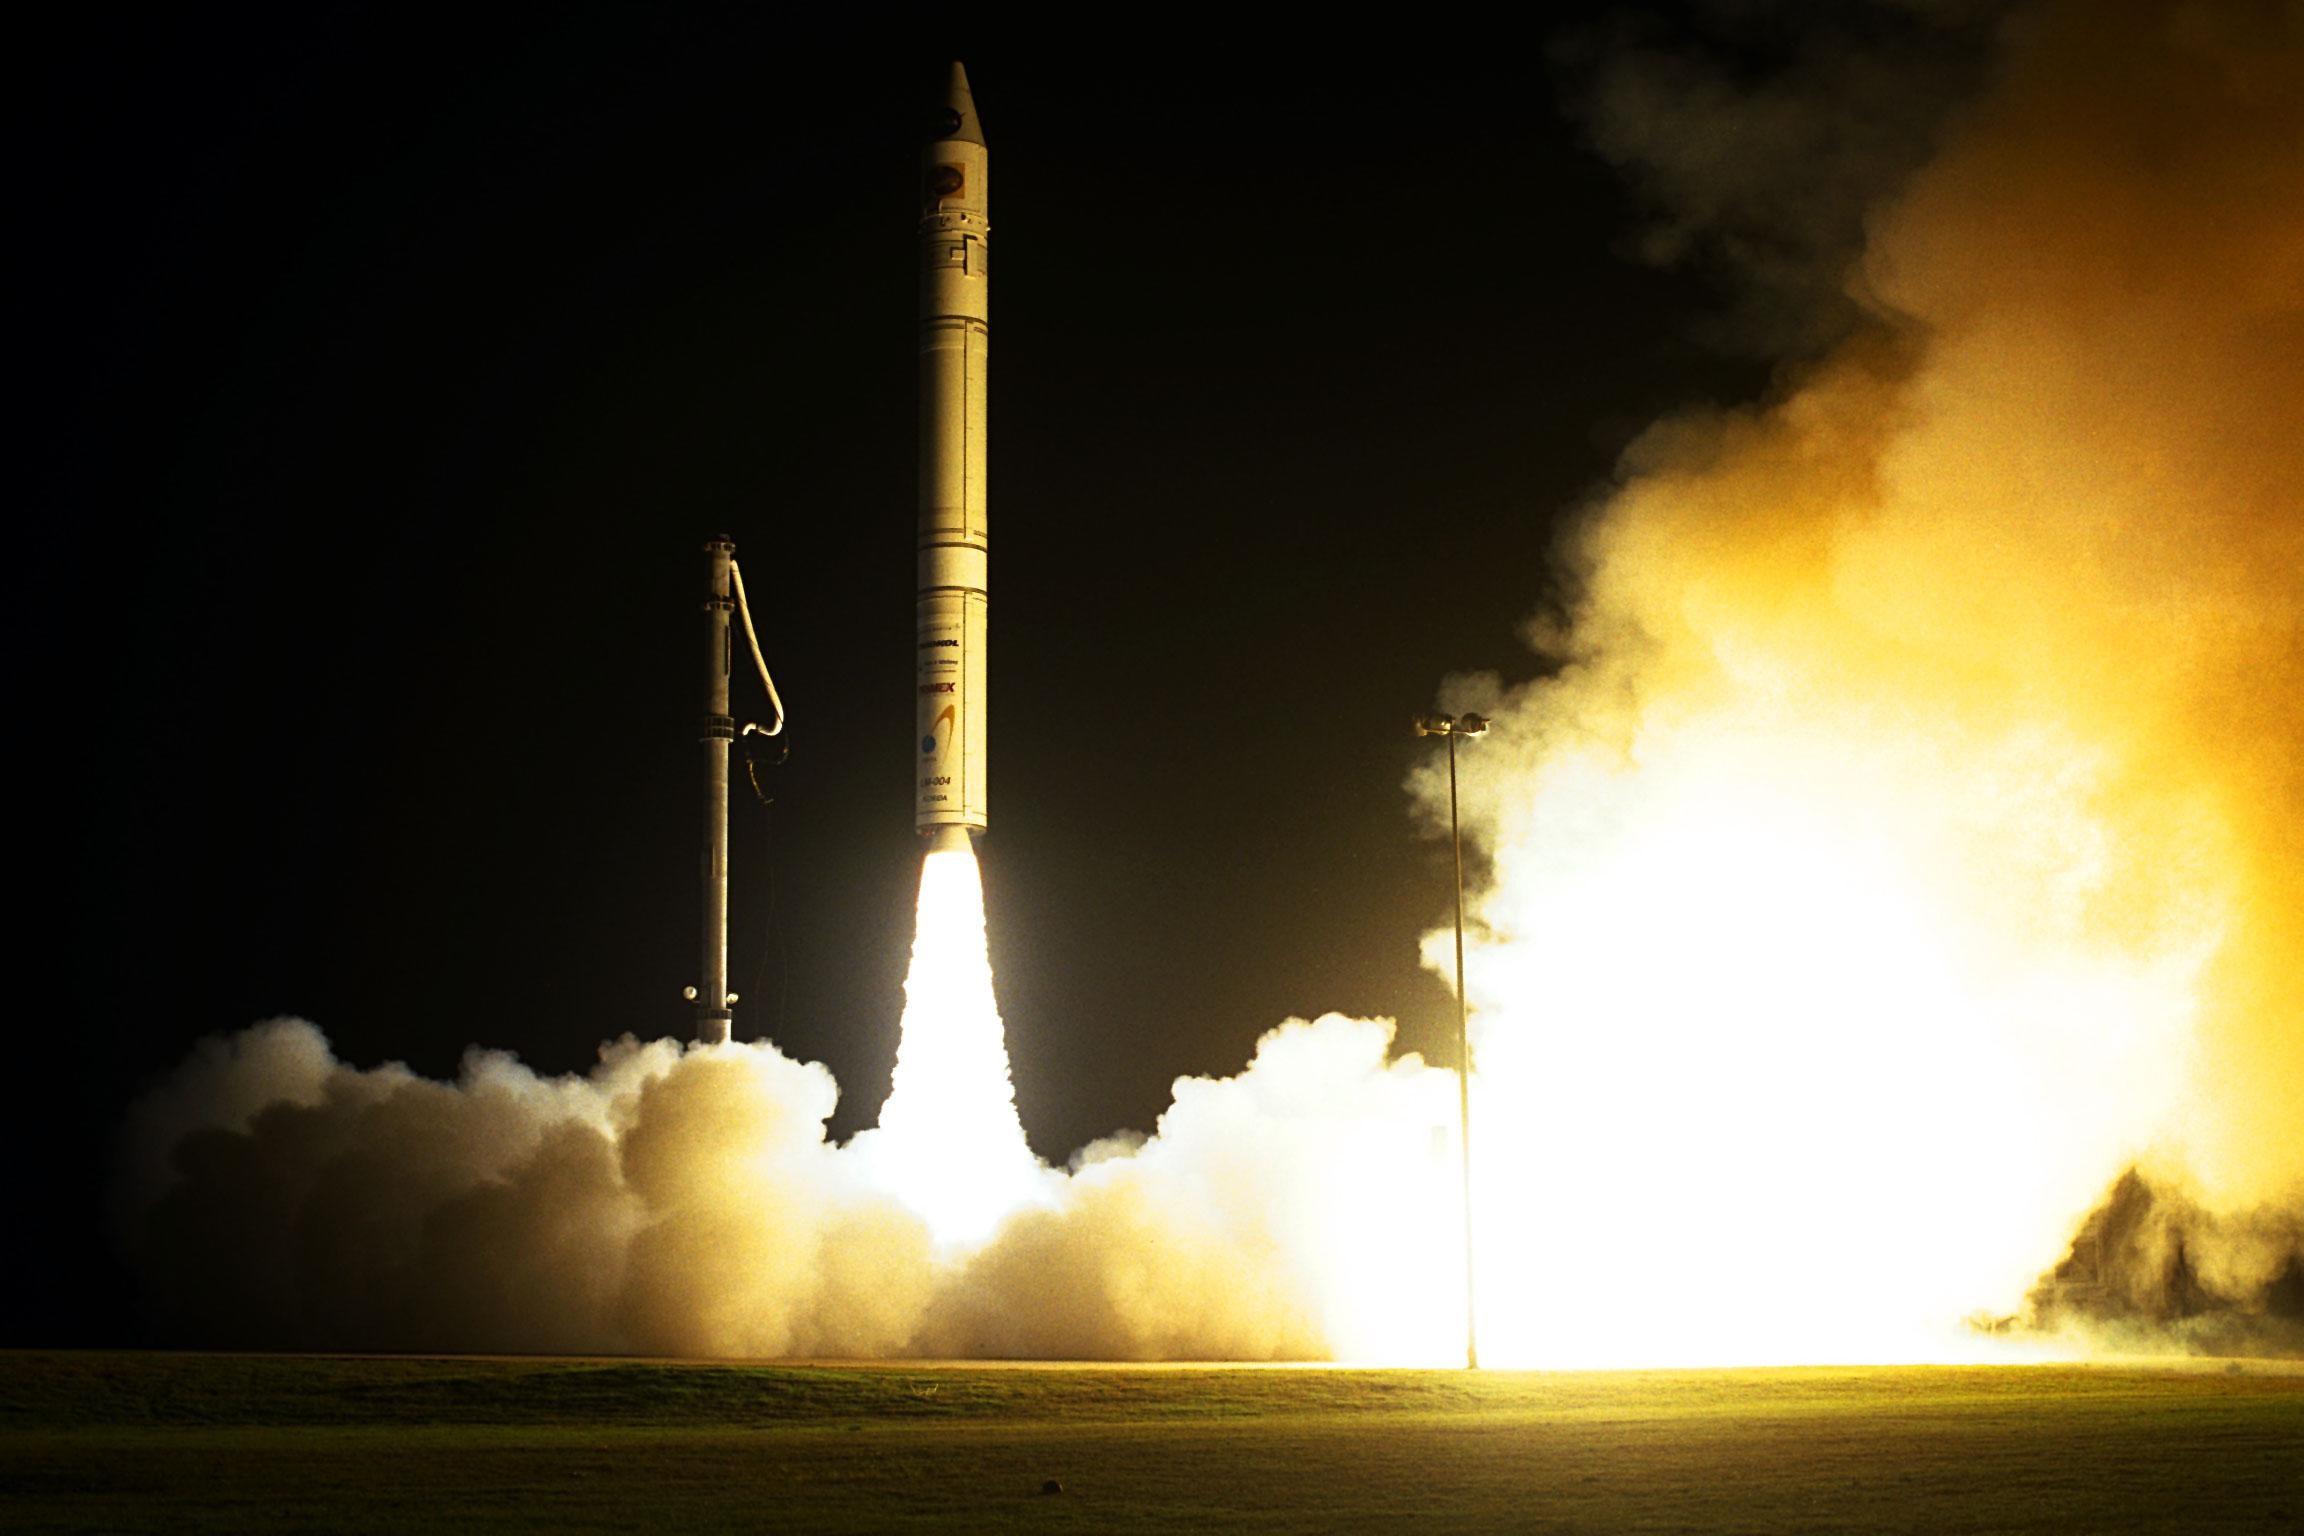 lunar space rocket - photo #42